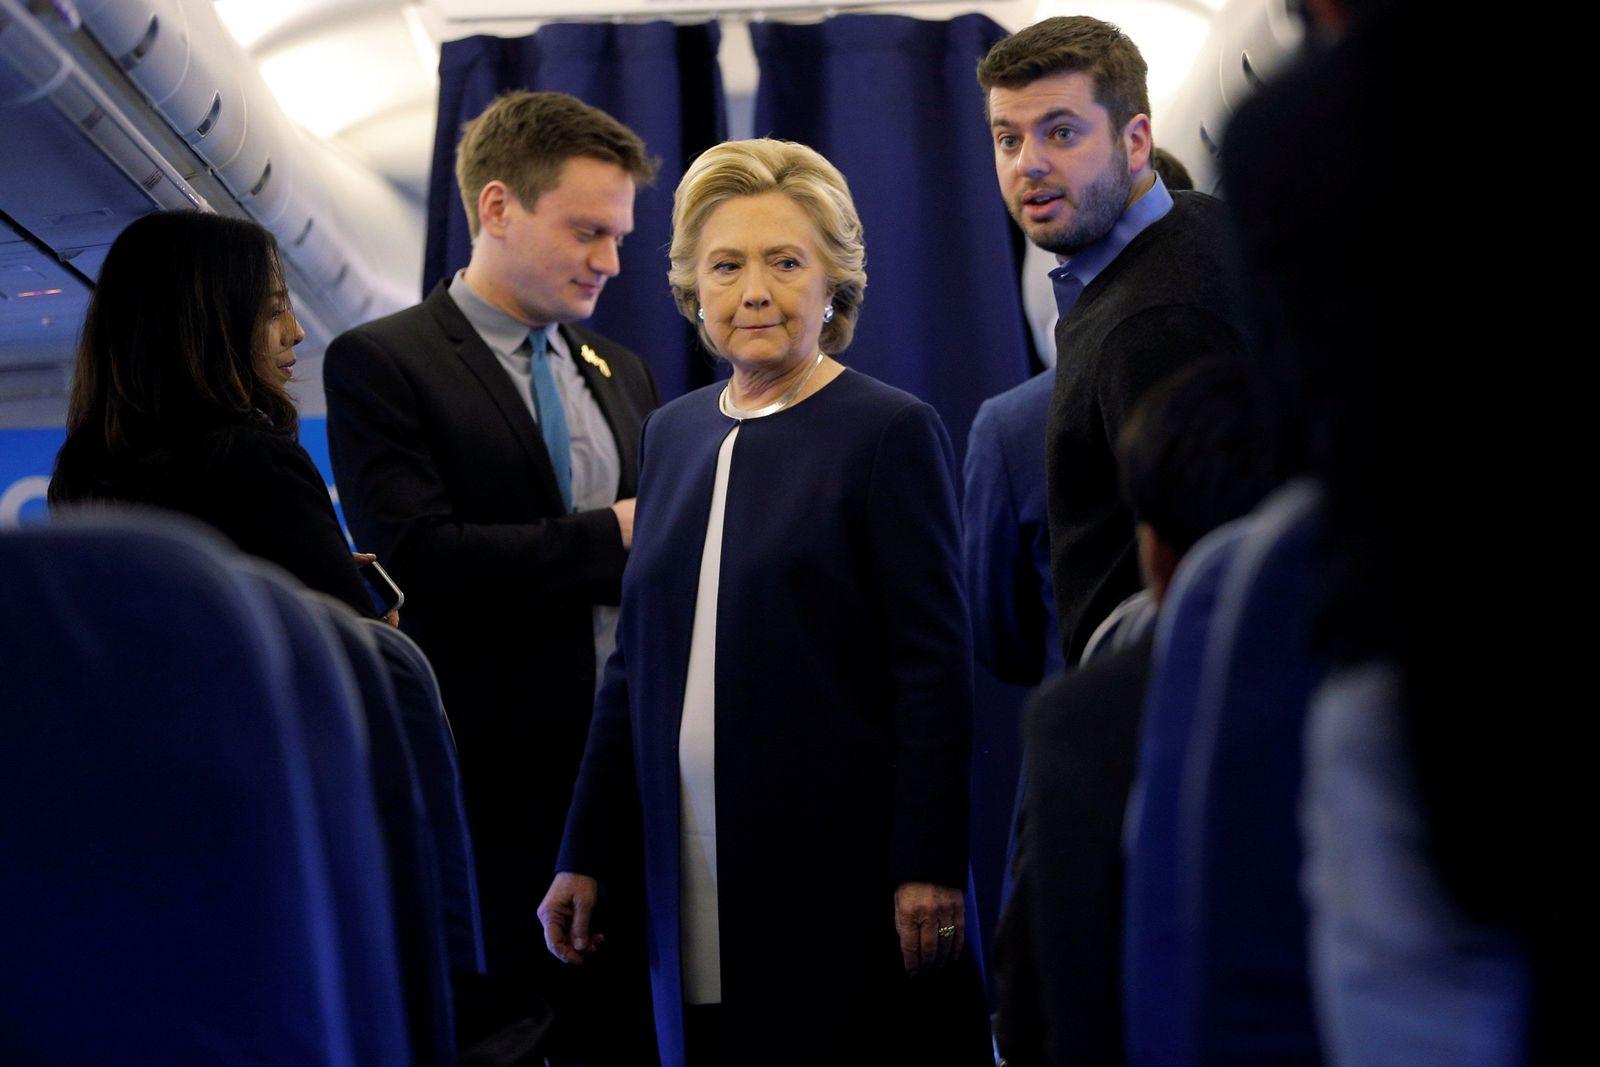 Clinton / Wahlkampf